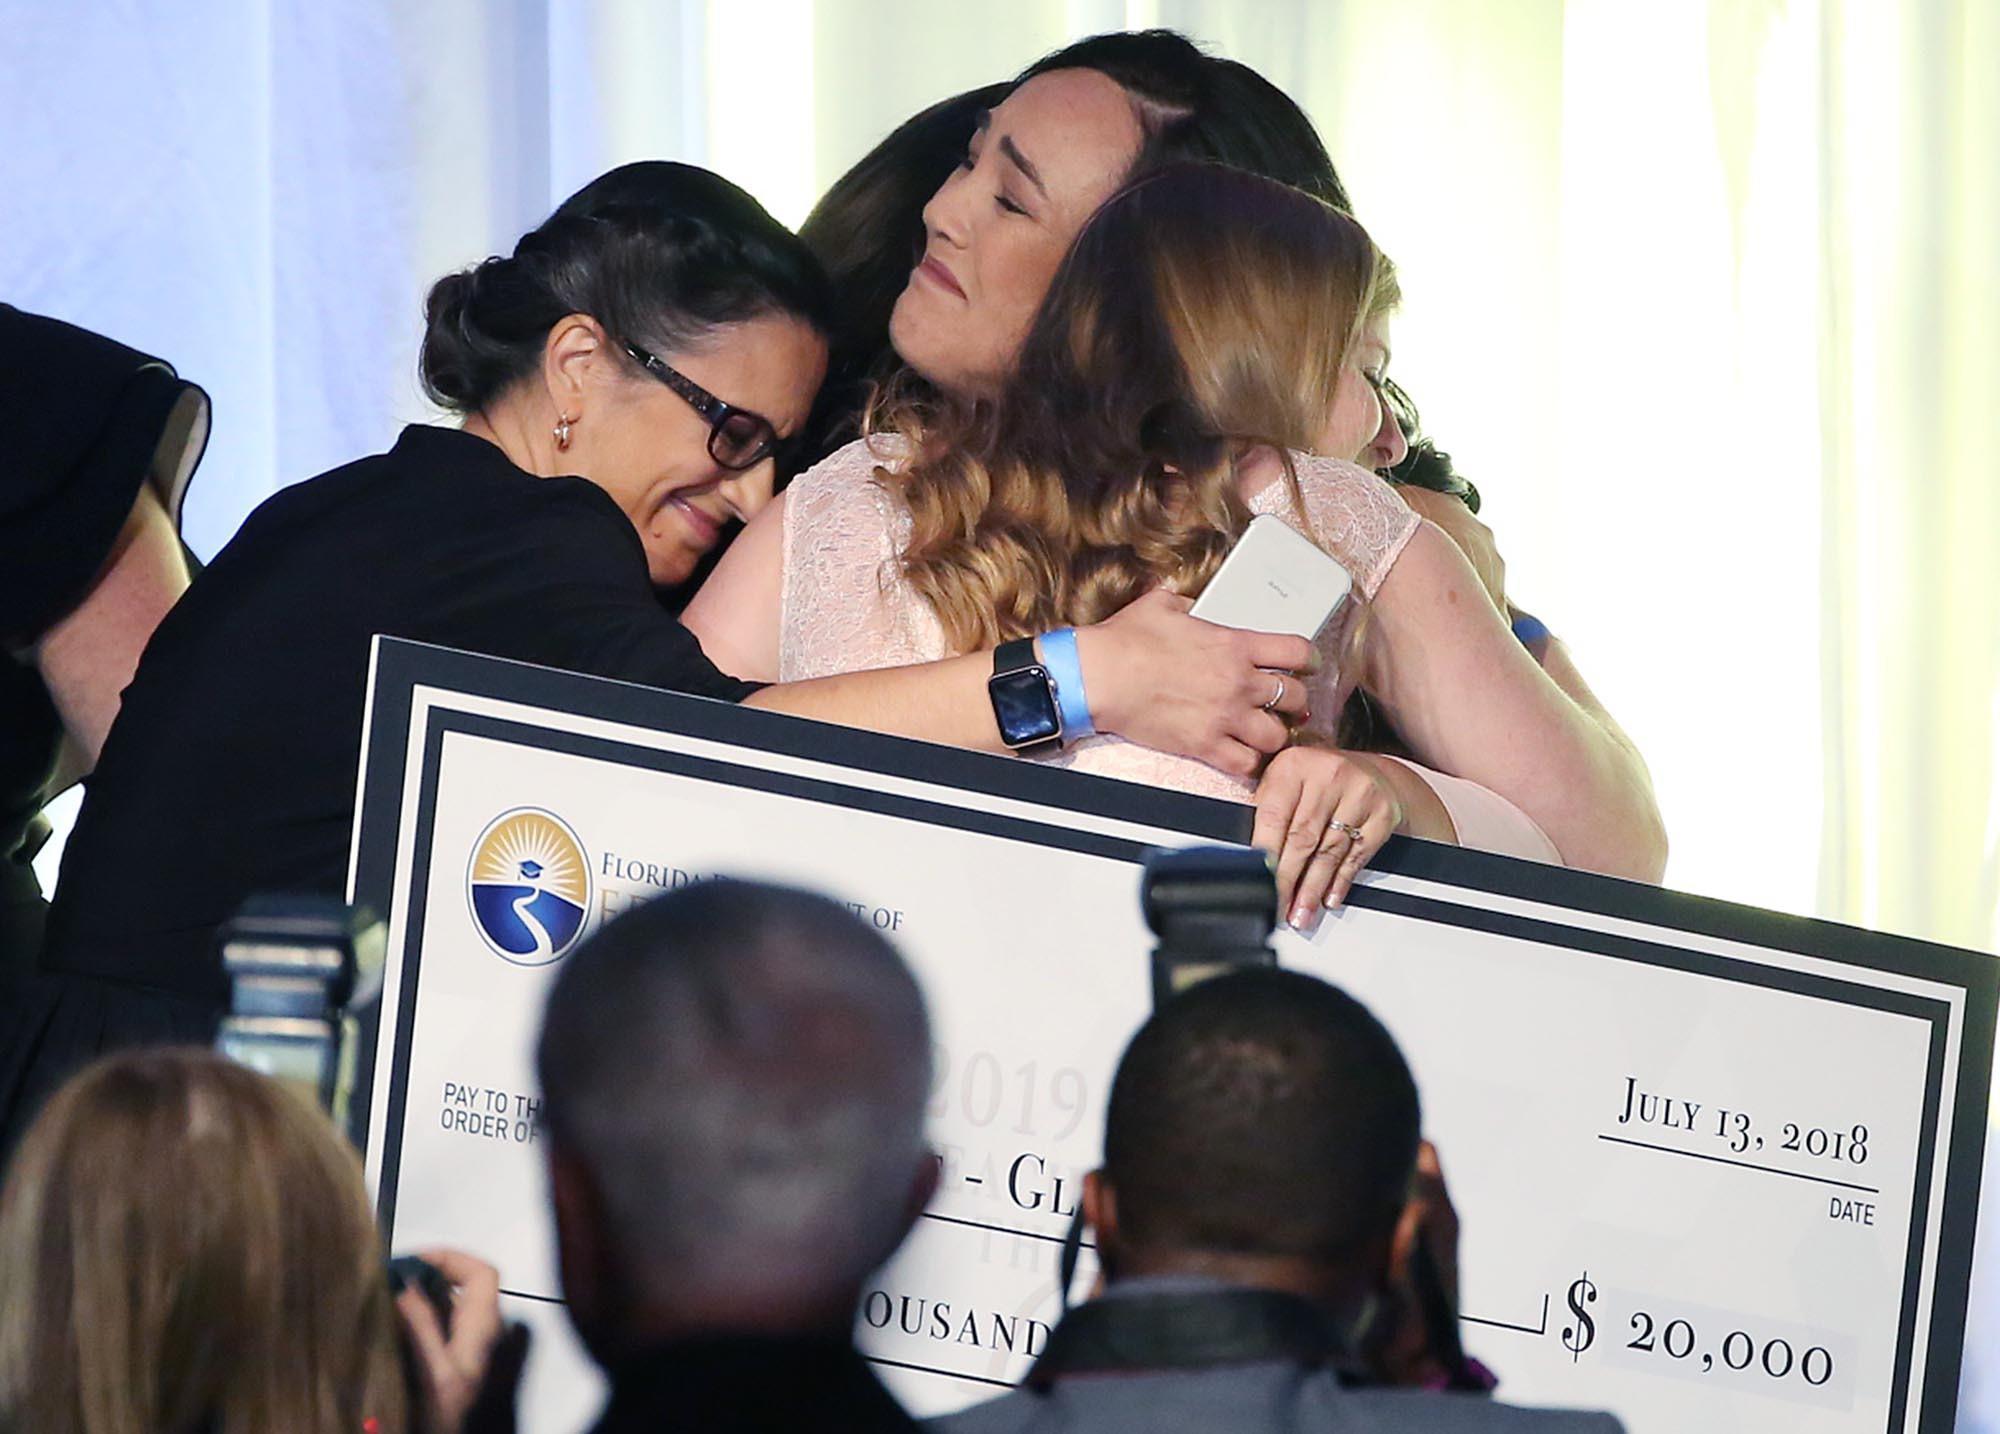 Florida's Teacher of the Year: Glades teacher wins top honor